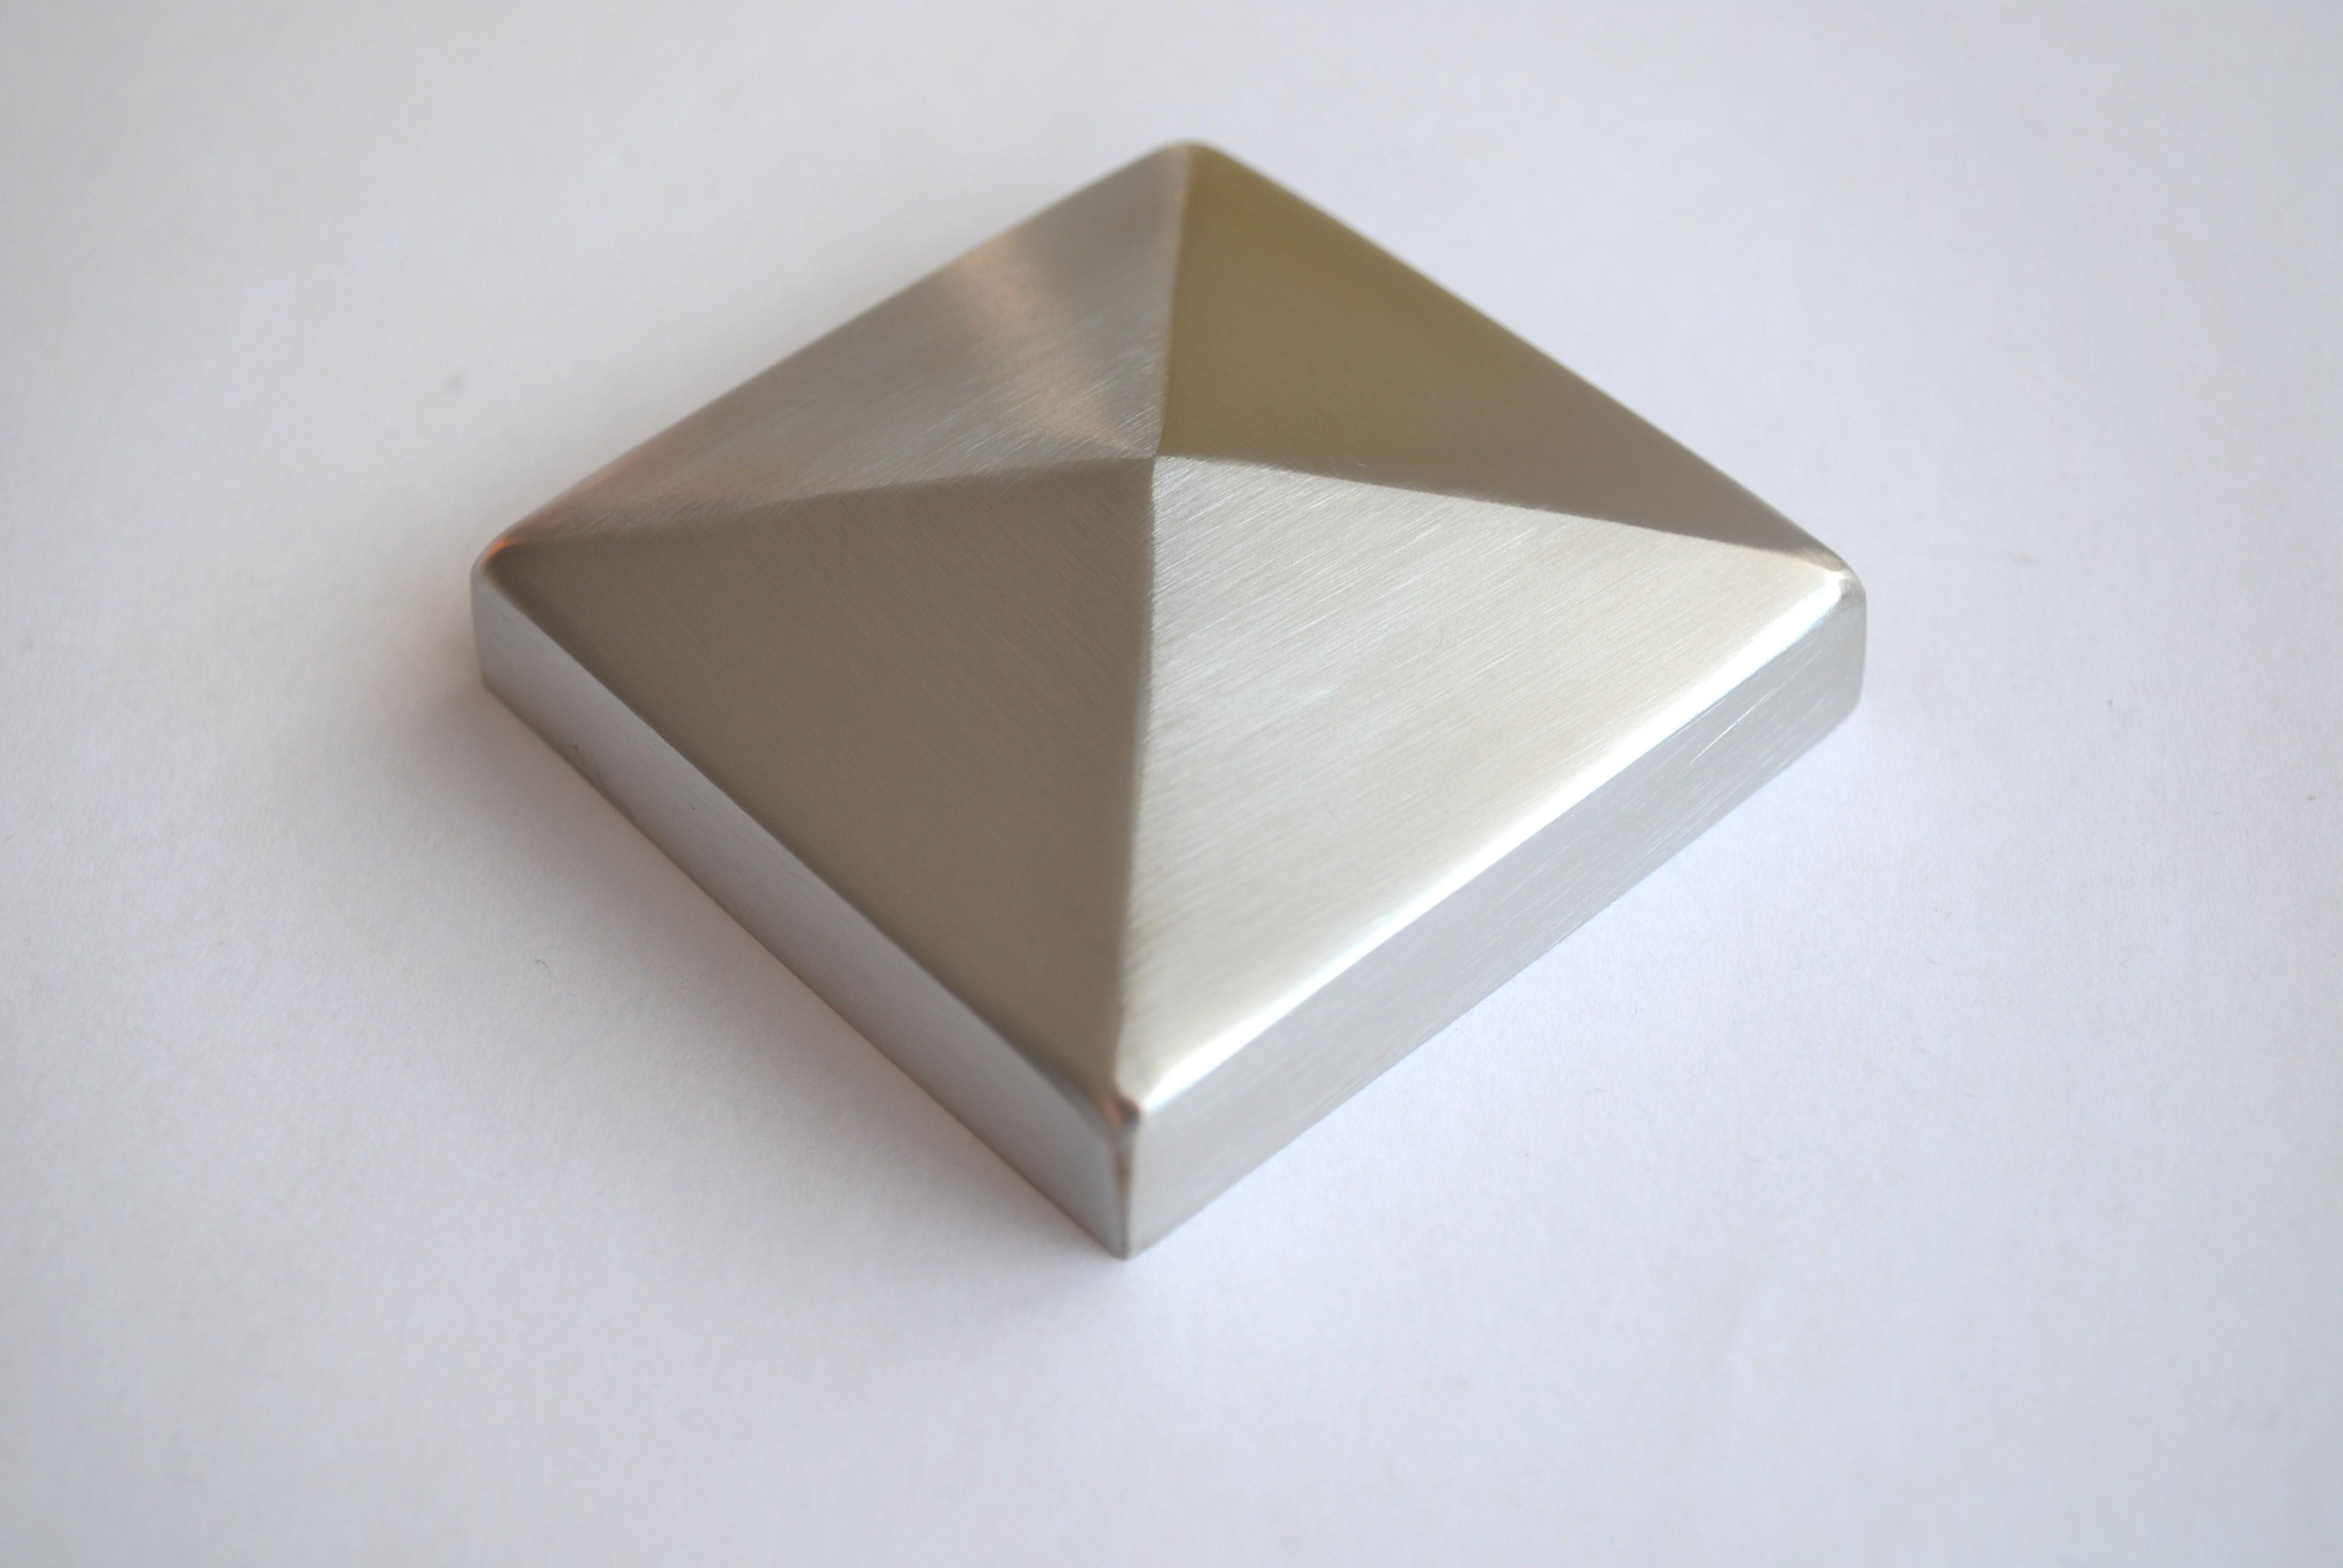 edelstahl pyramidenkappe 80x80 geschliffen. Black Bedroom Furniture Sets. Home Design Ideas